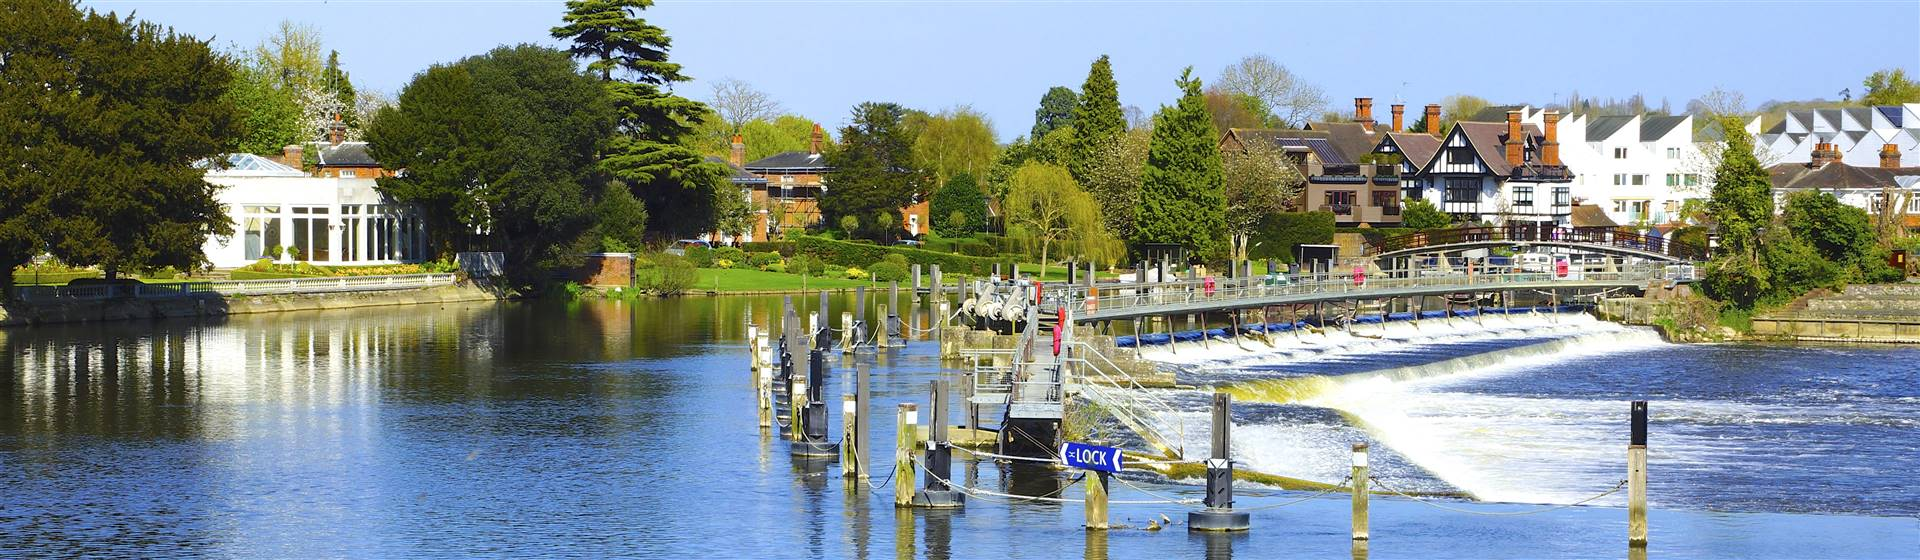 Oxford, Henley & Blenheim Palace